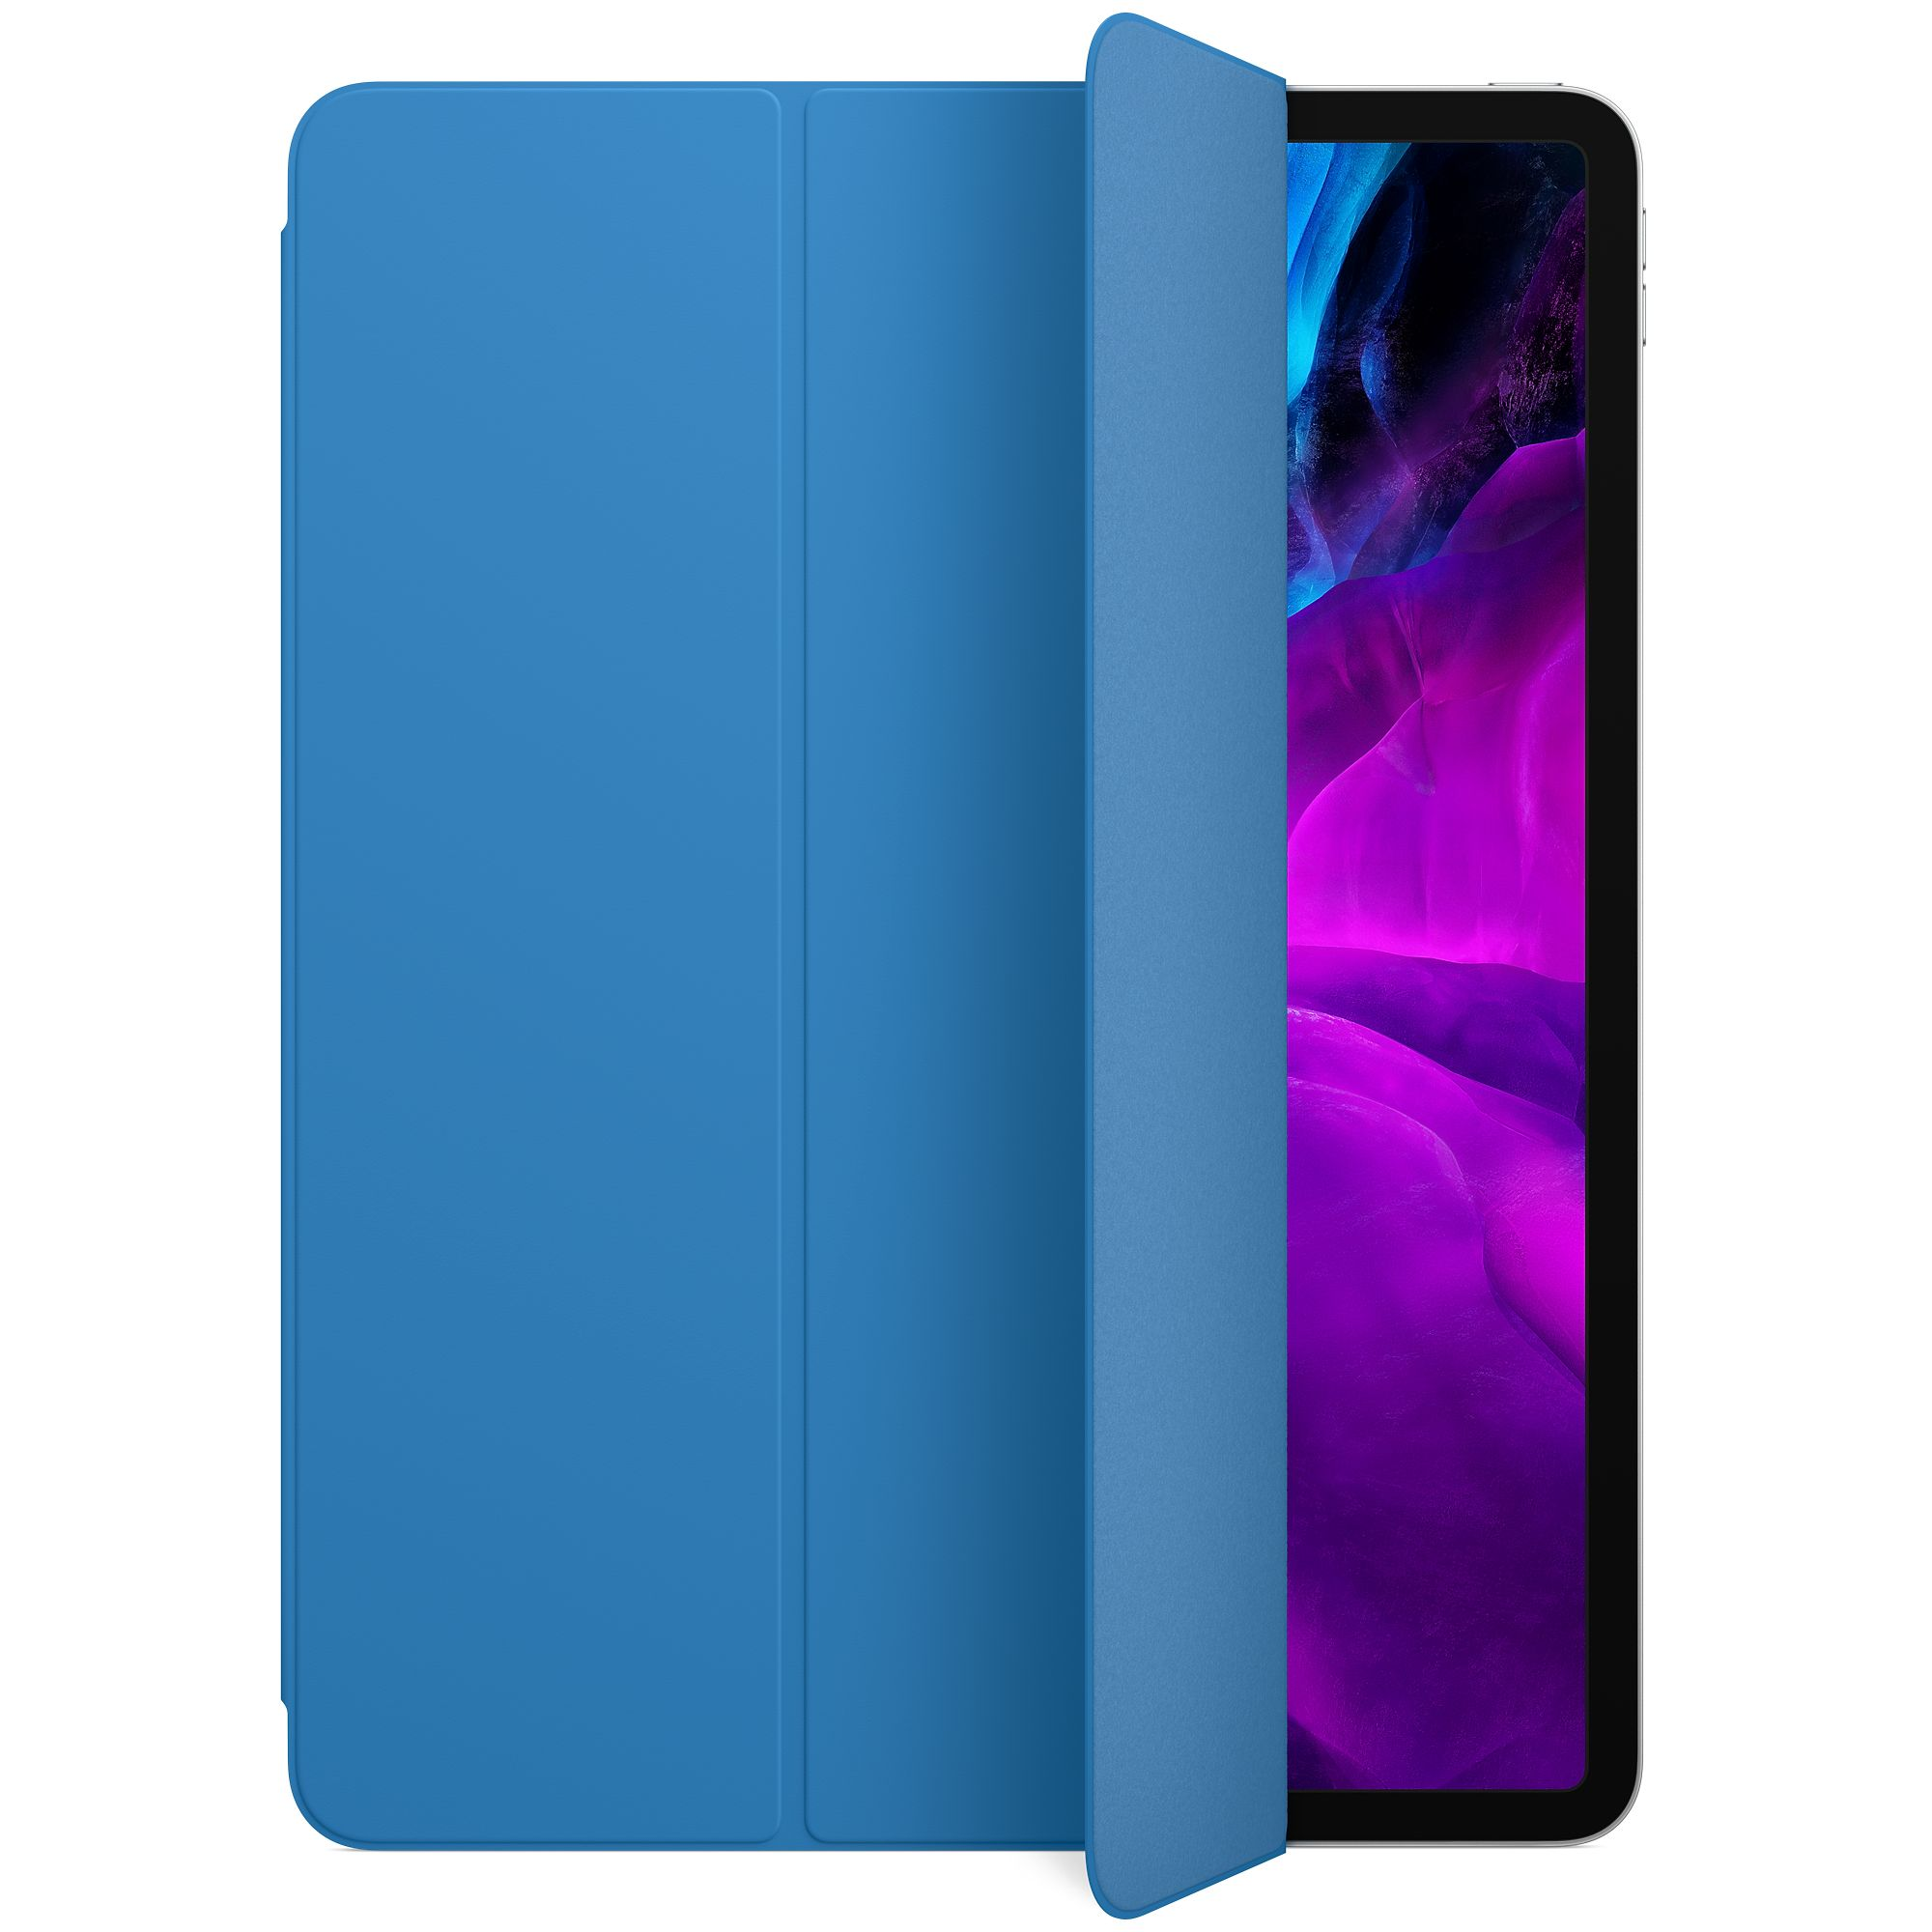 "Чехол Apple Smart Folio для iPad Pro 12.9"" Surf Blue MXTD2"